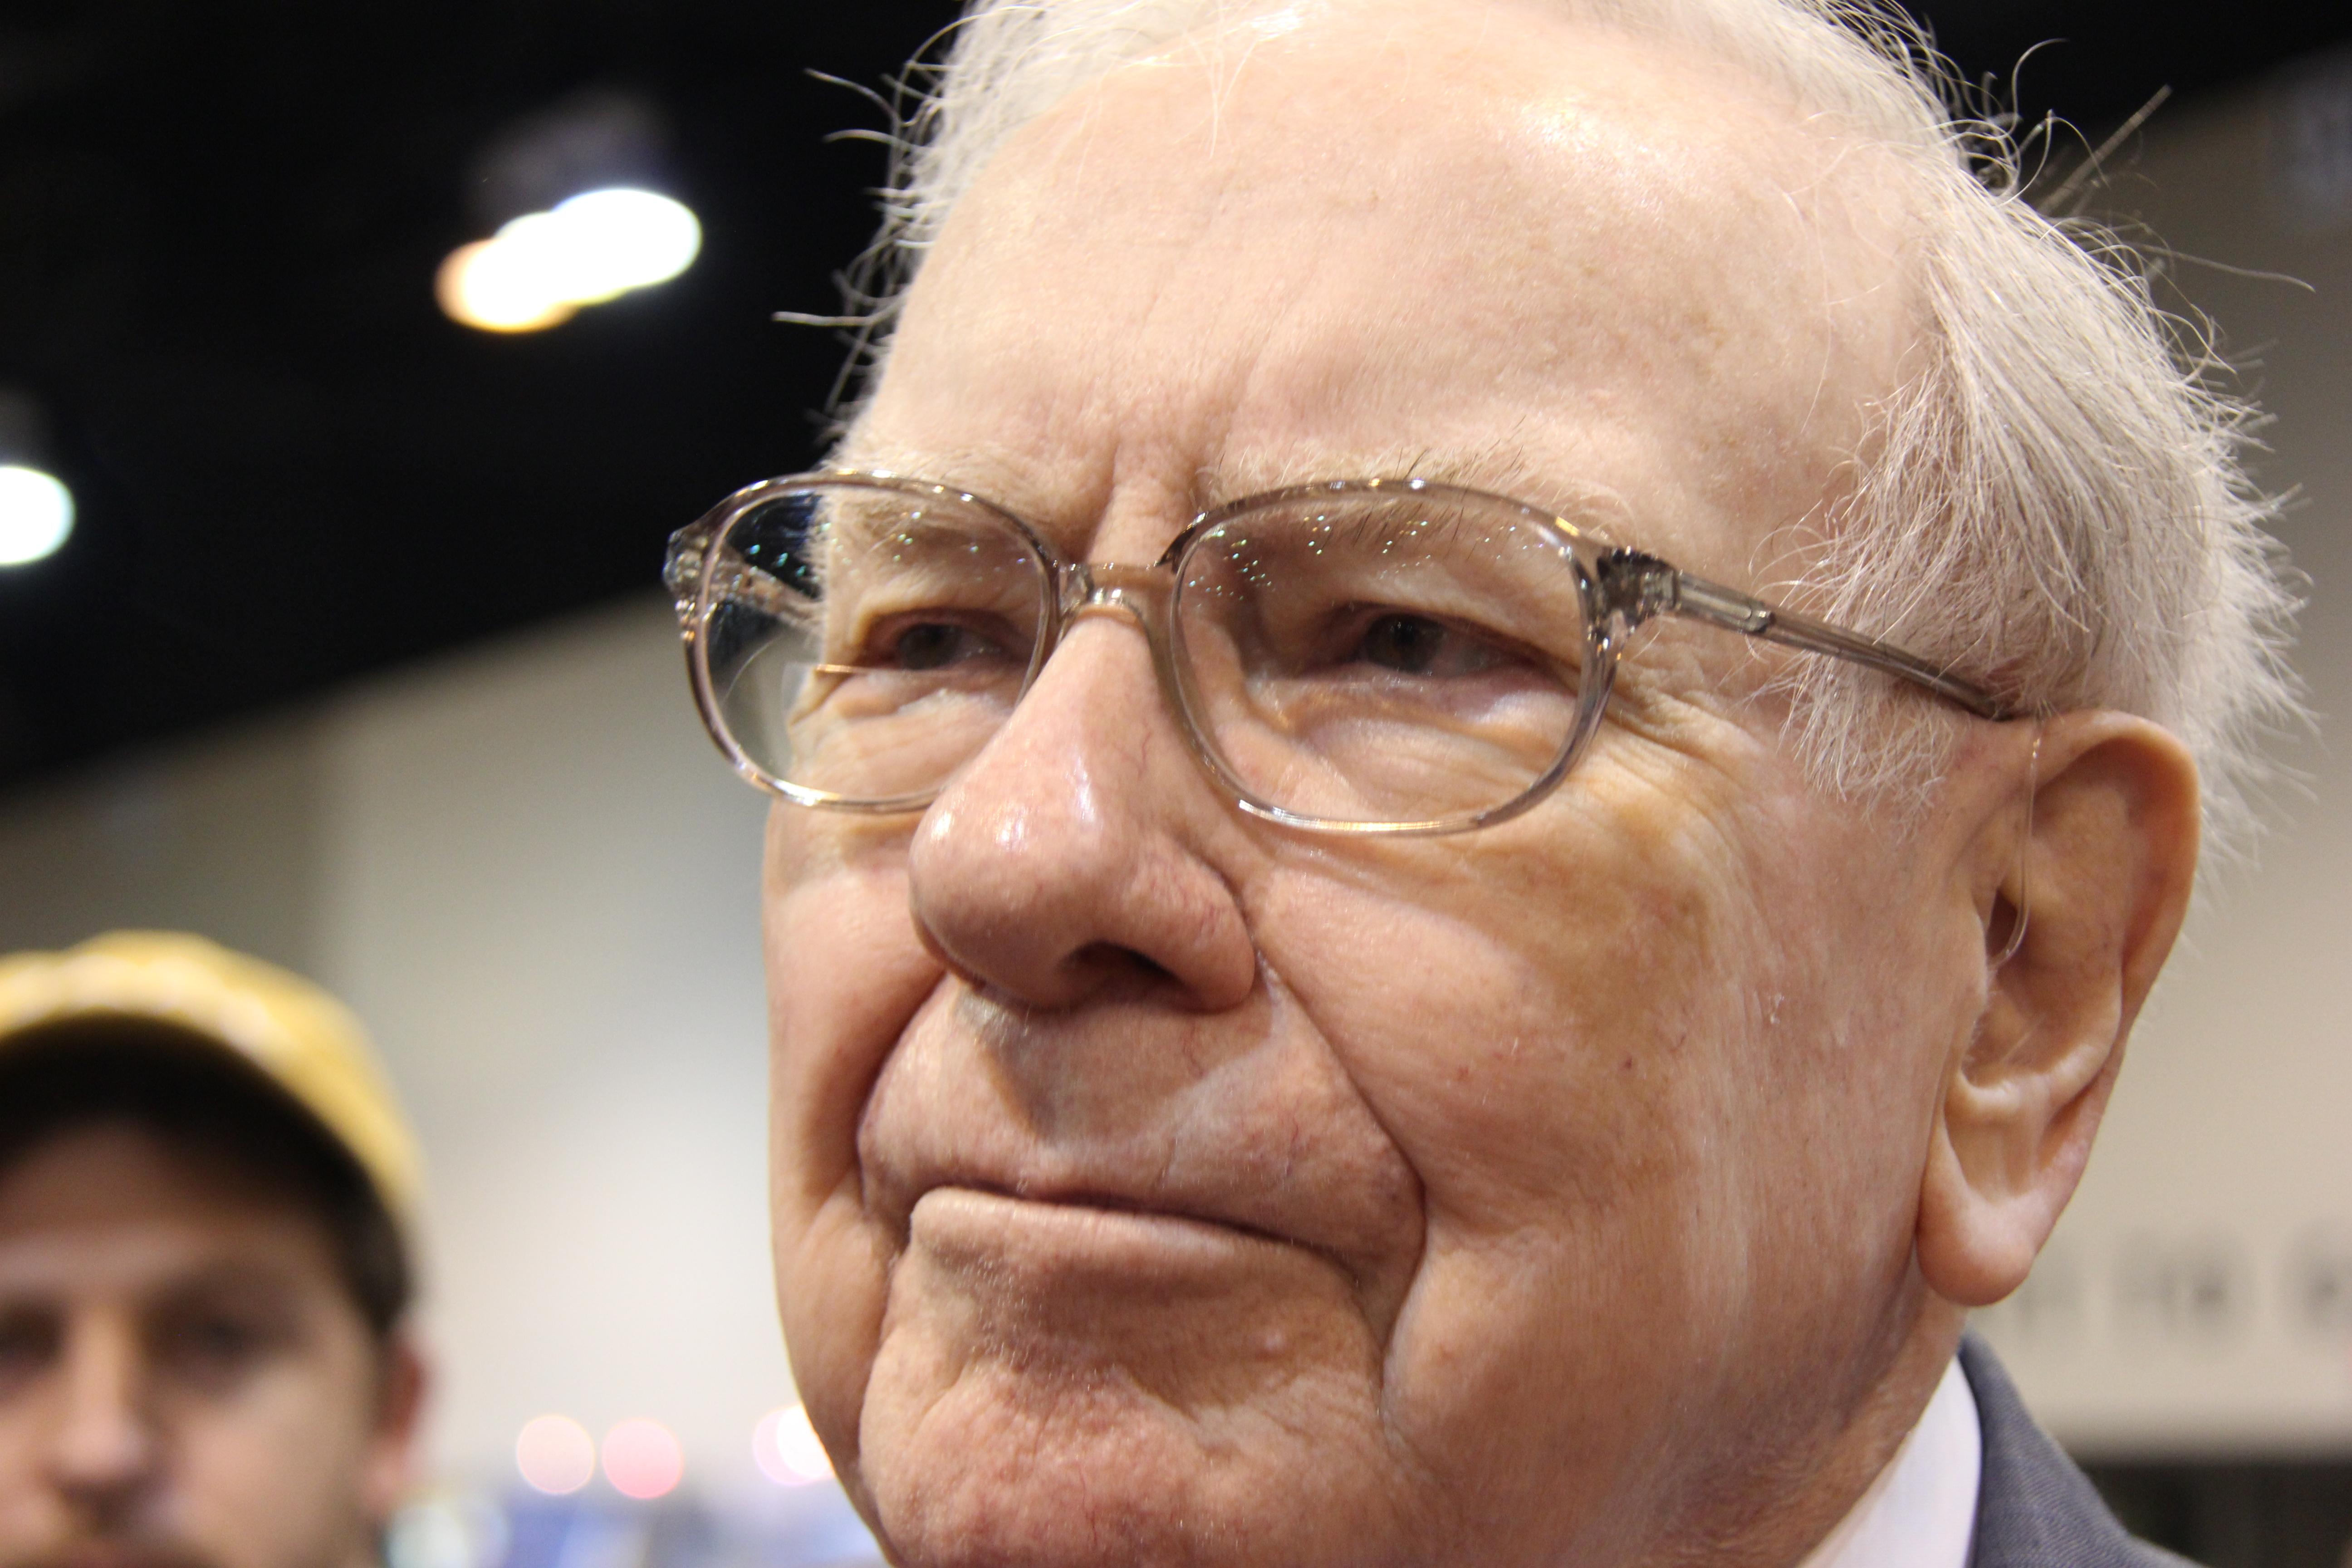 3 Warren Buffett Stocks to Buy if the Market Crashes